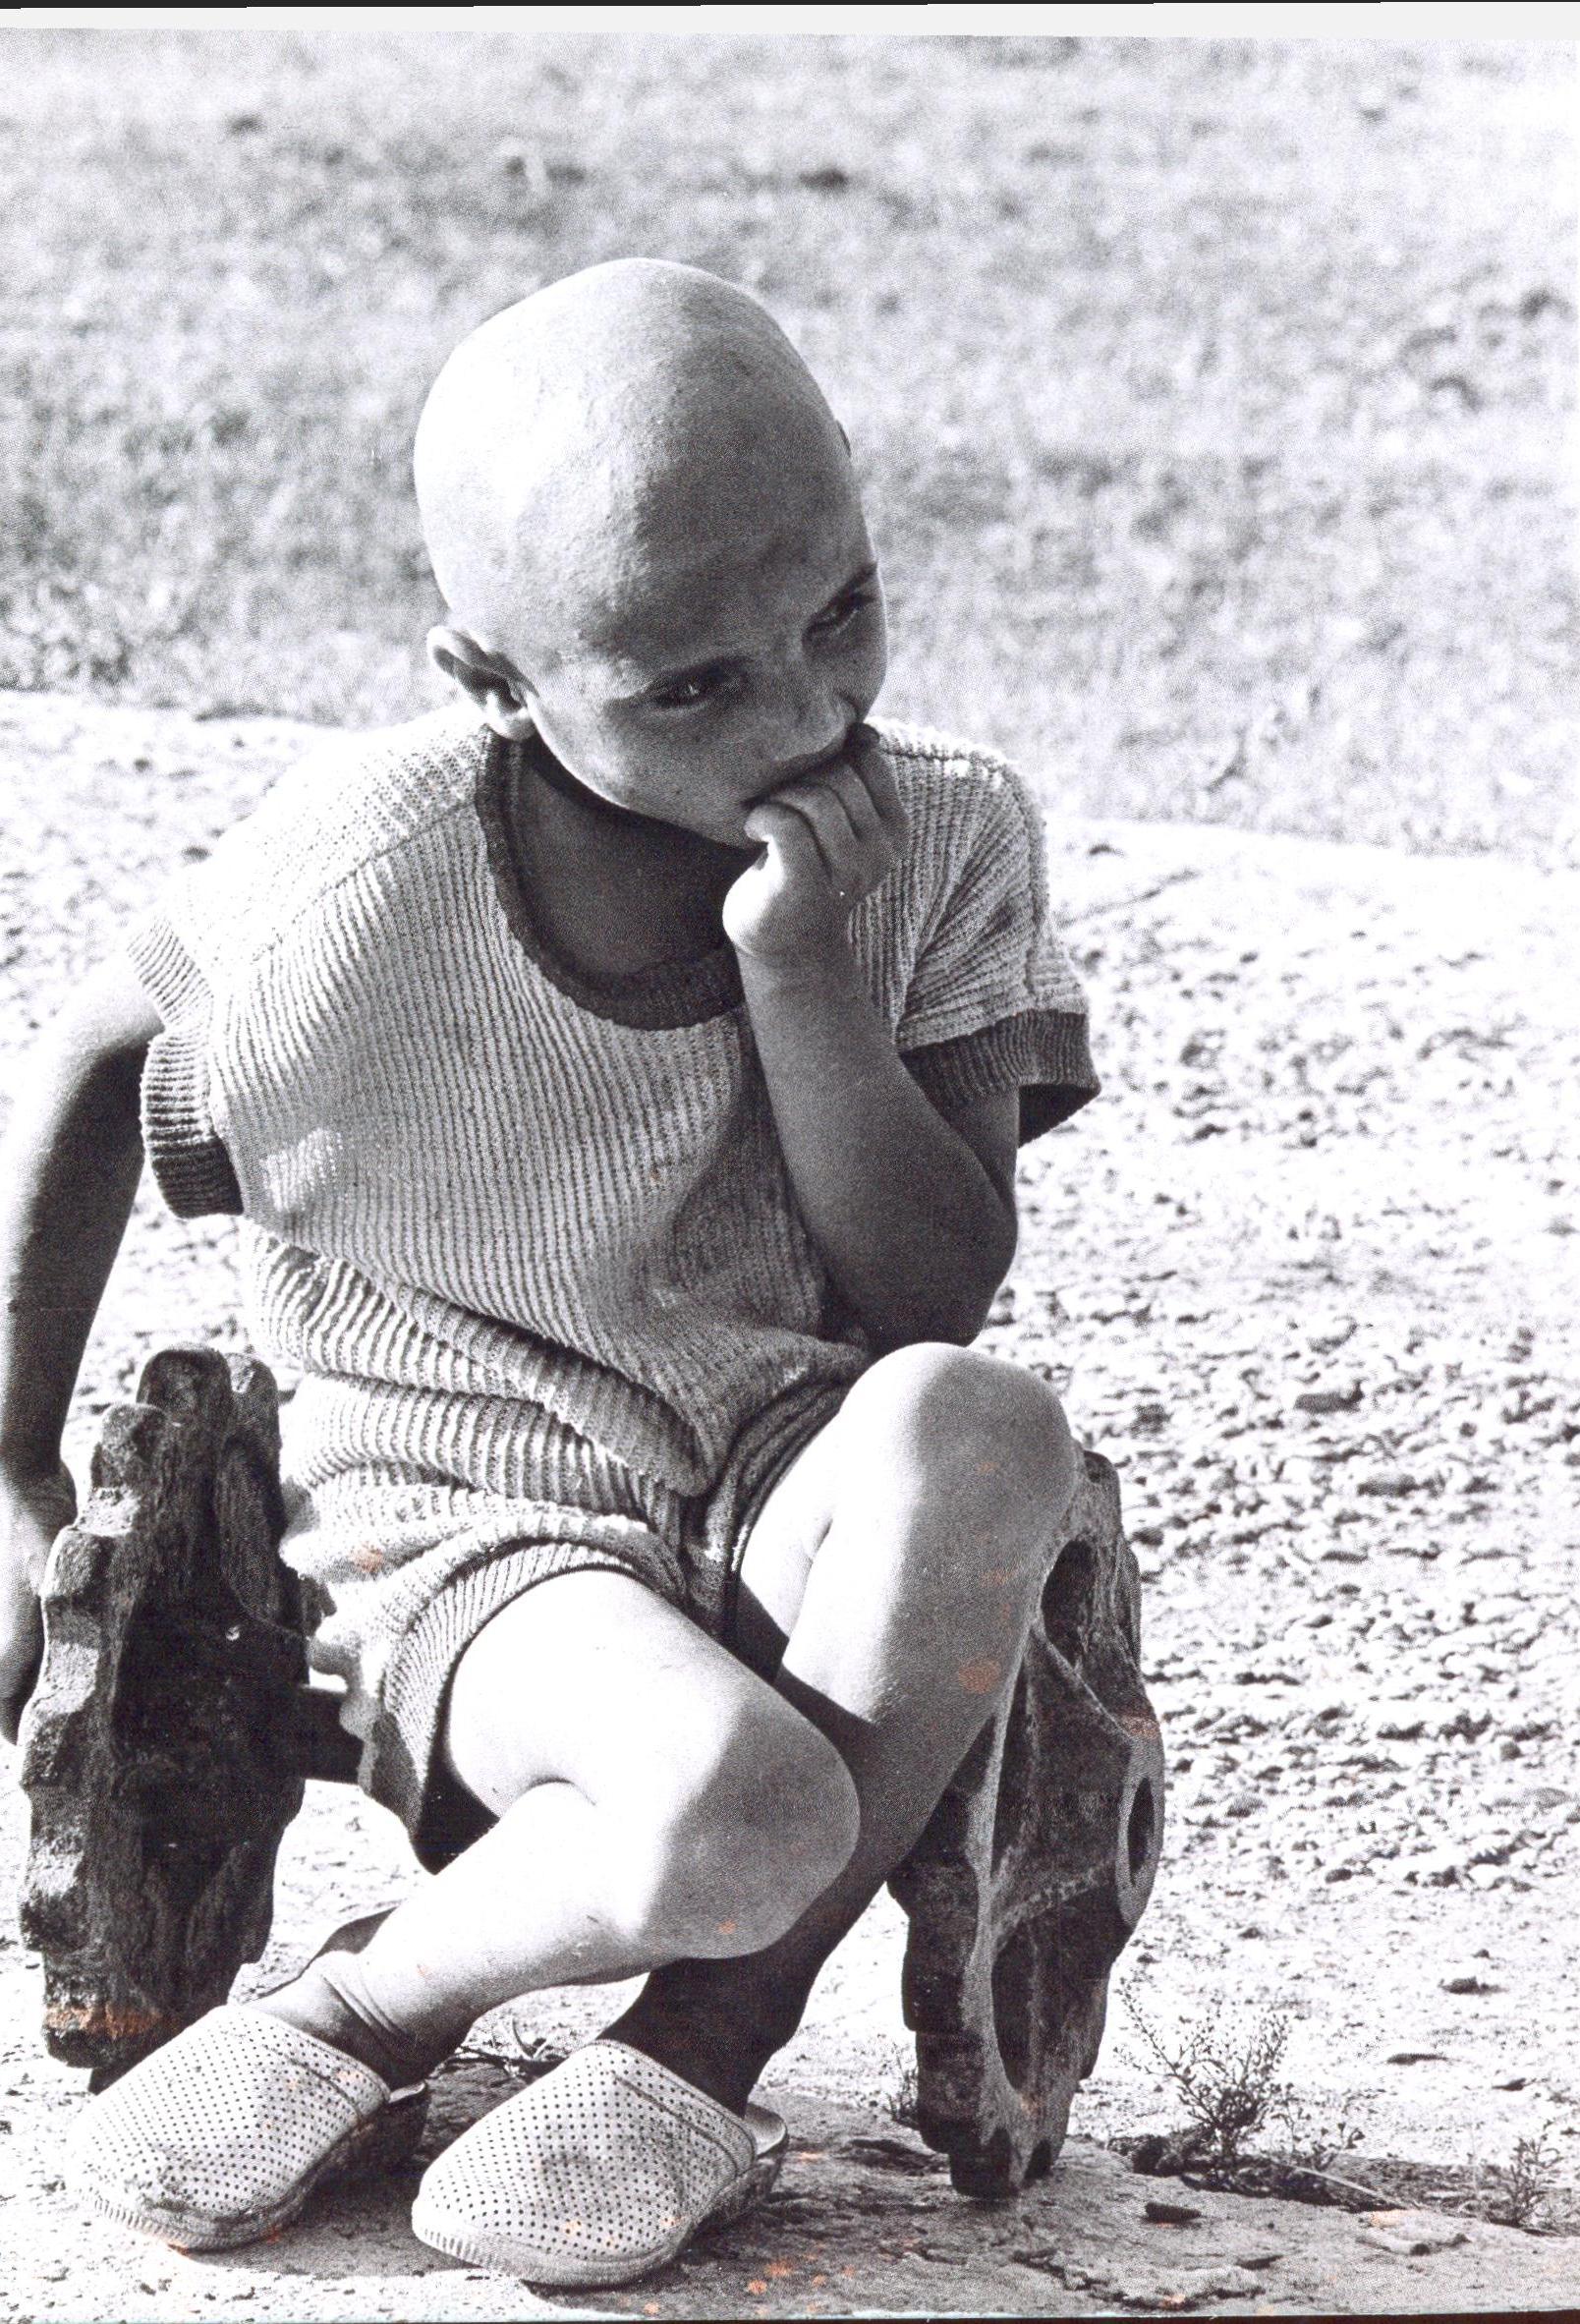 Mirnaib Hasanoglu